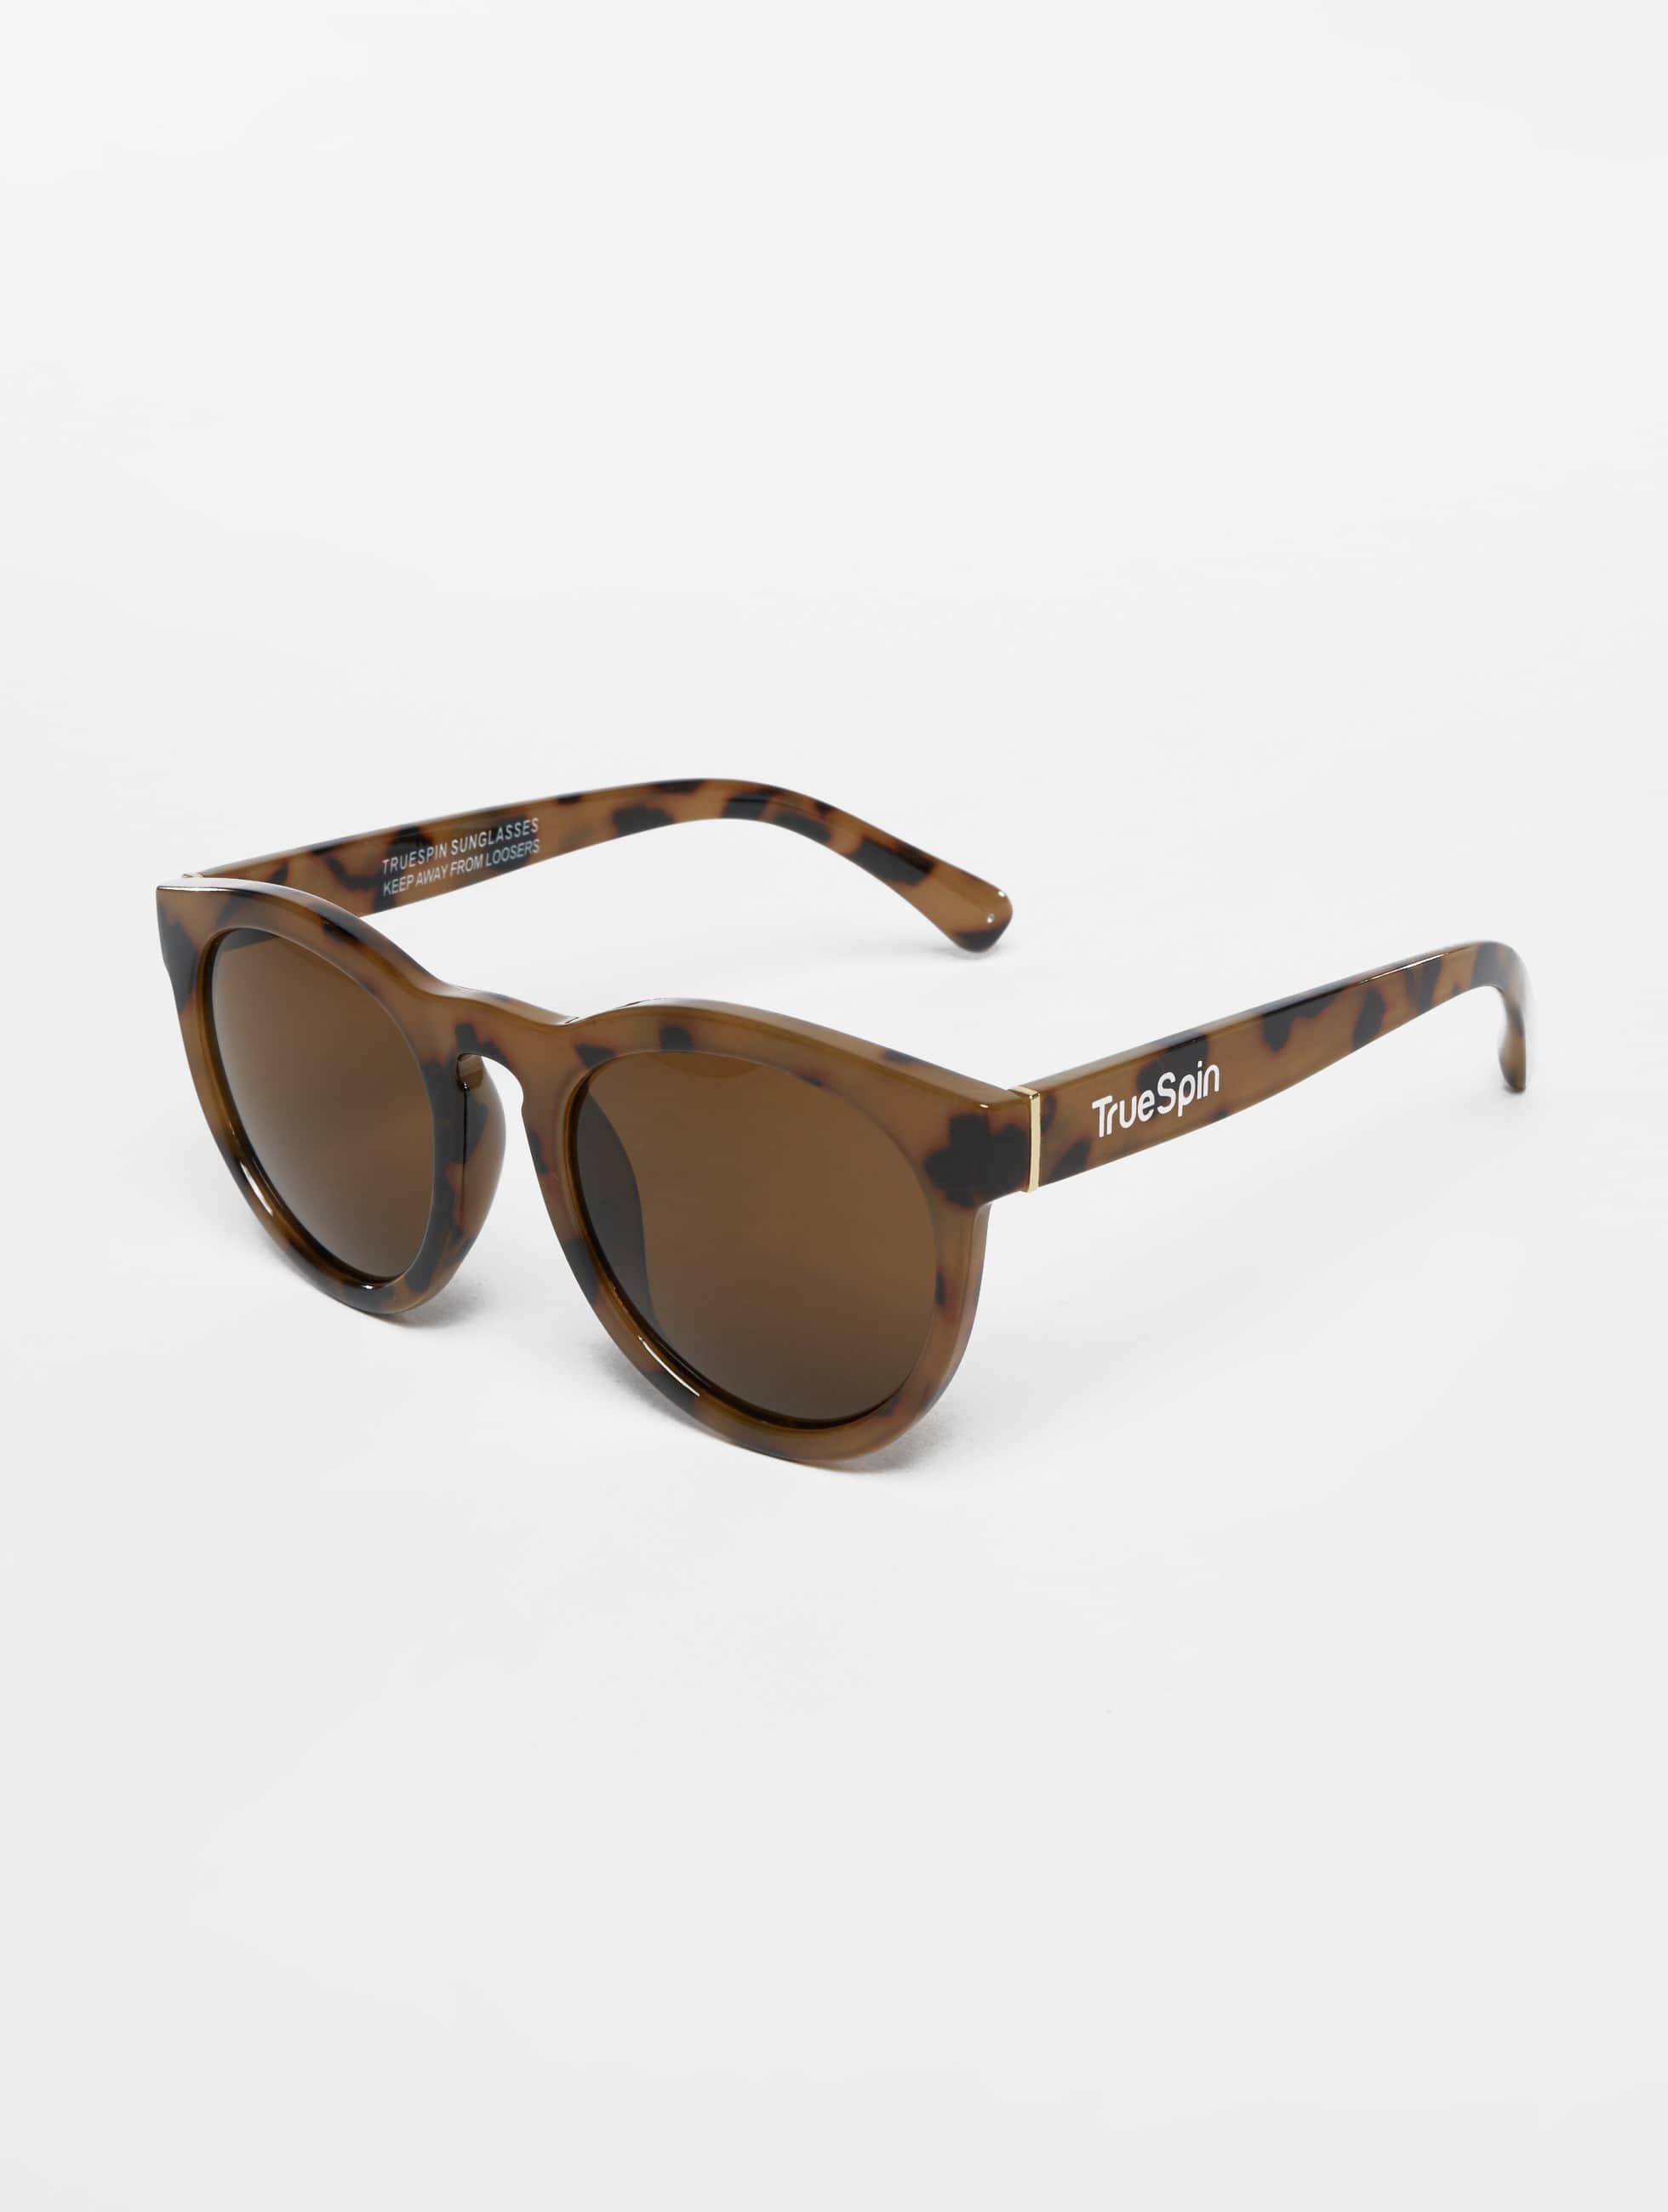 TrueSpin Sonnenbrille Desert braun